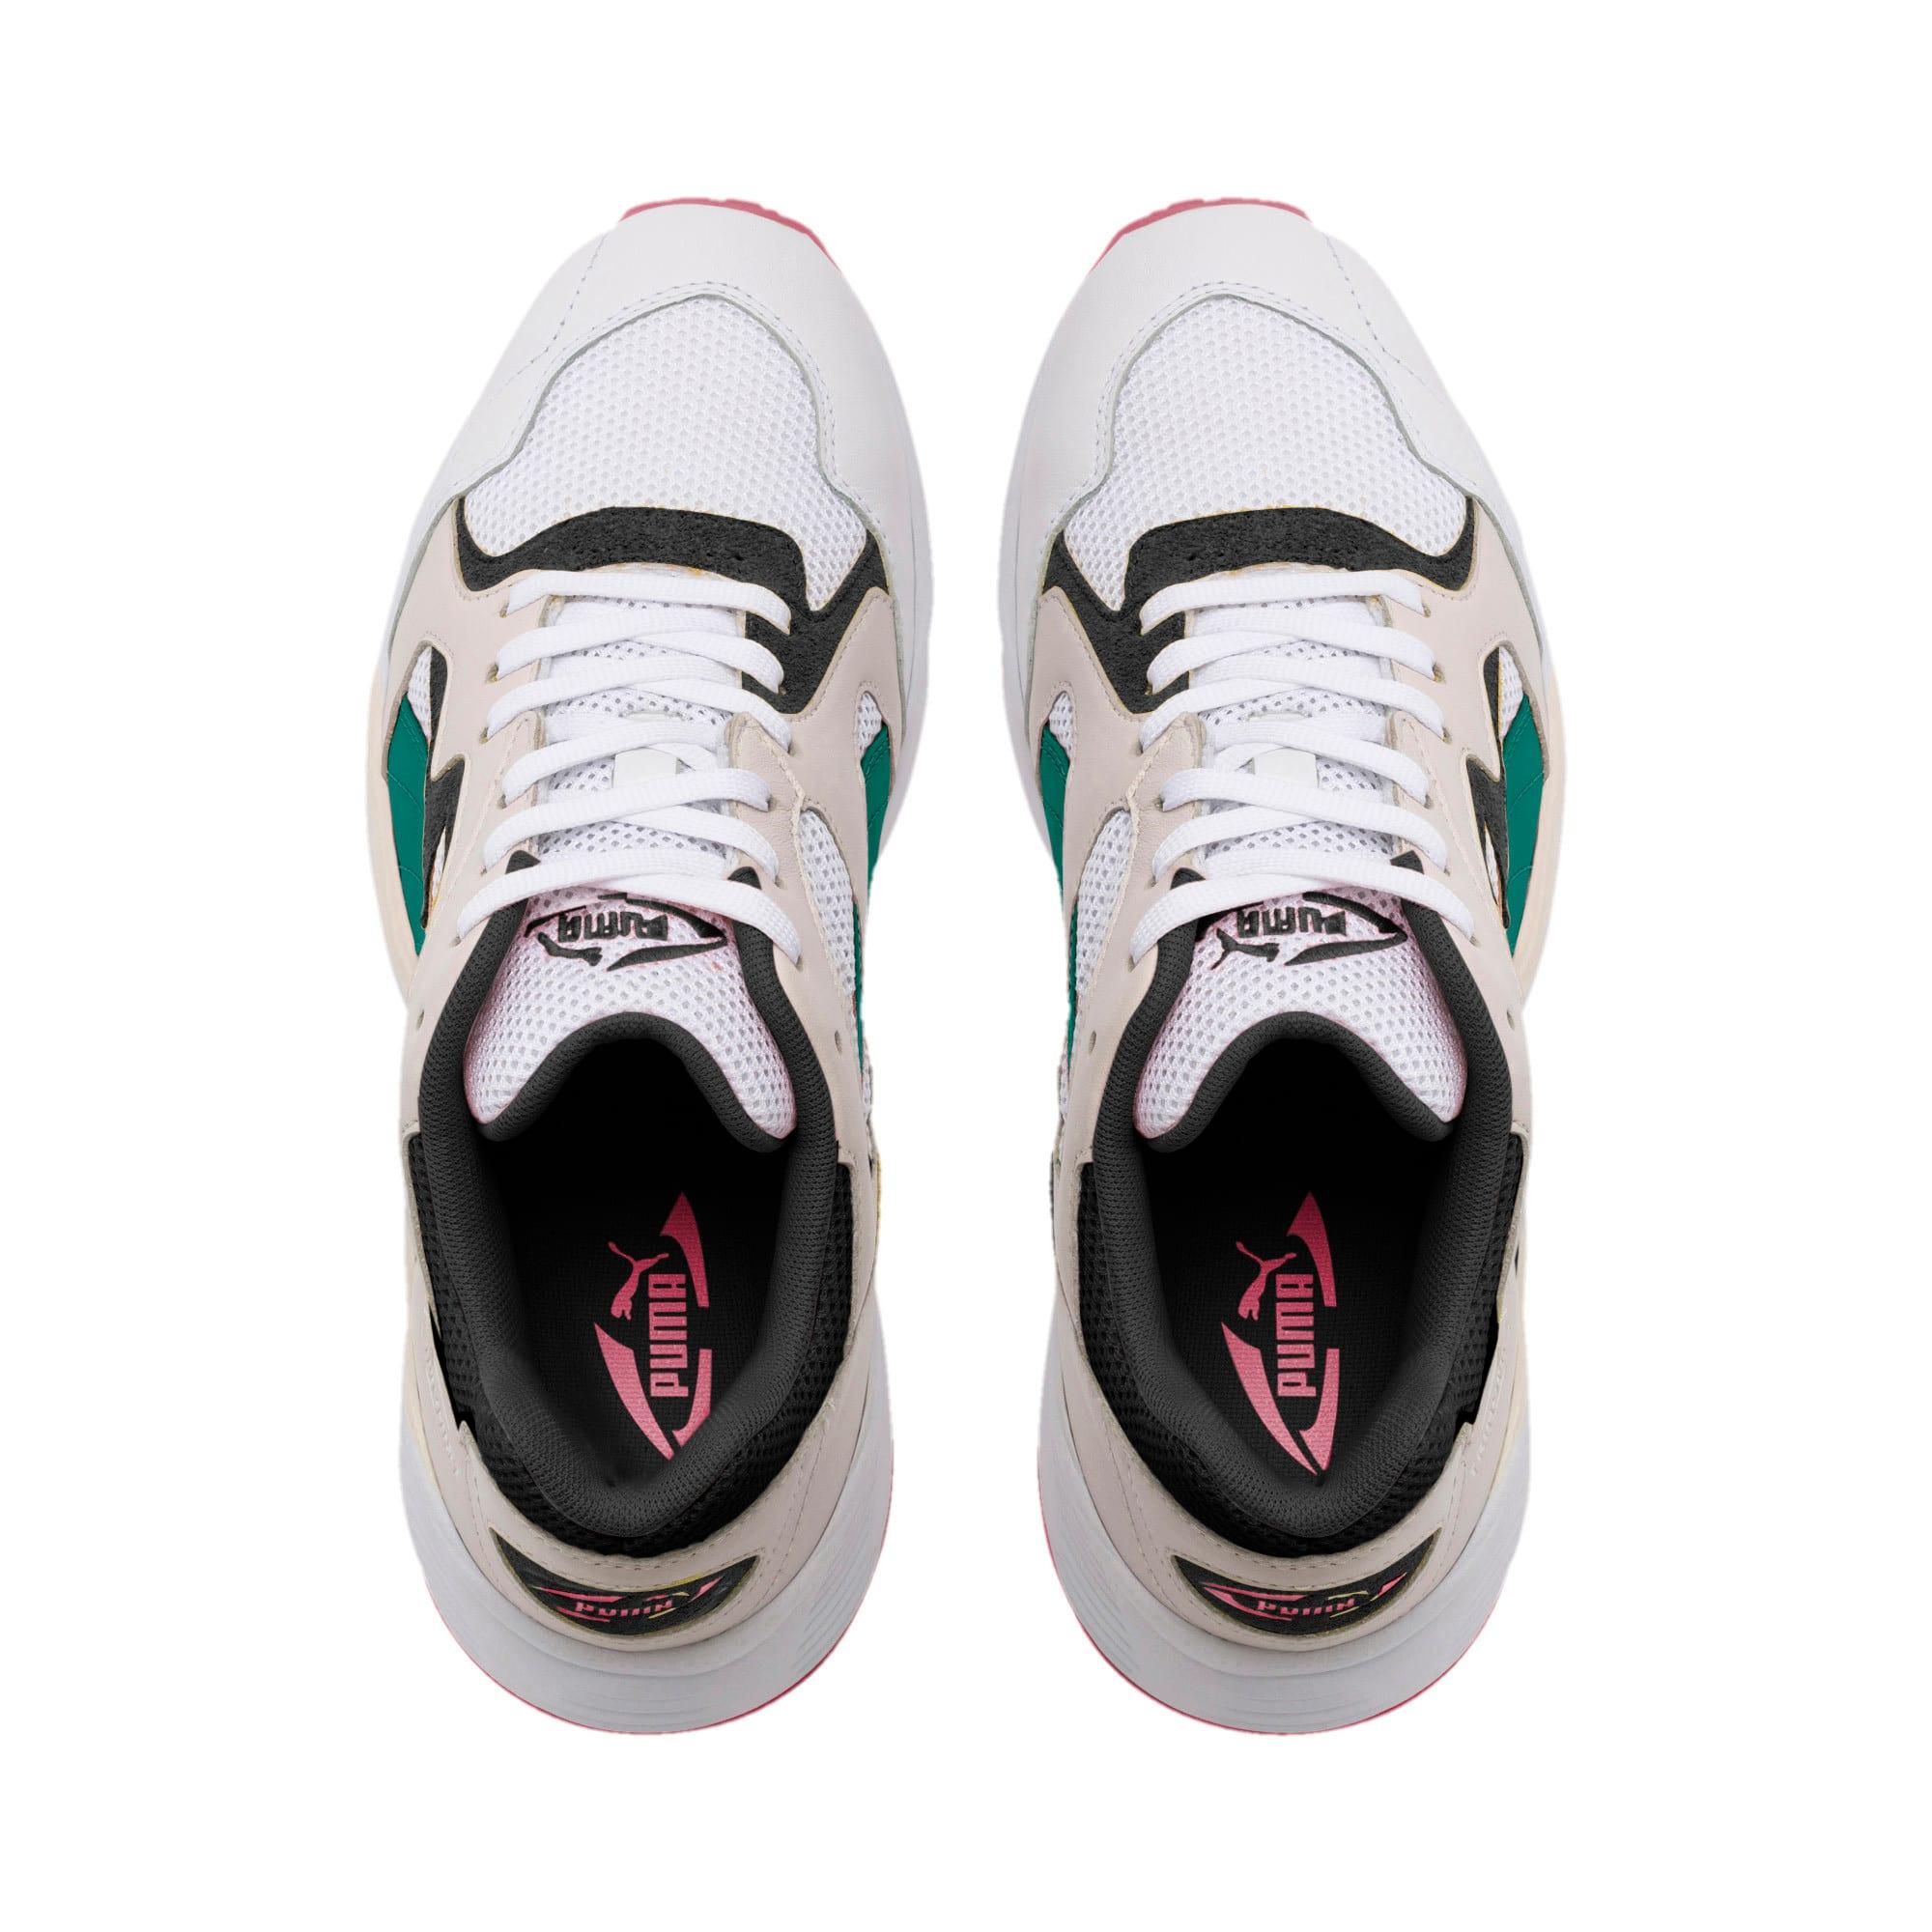 Thumbnail 6 of Prevail Classic Sneakers, Puma White-Teal Green, medium